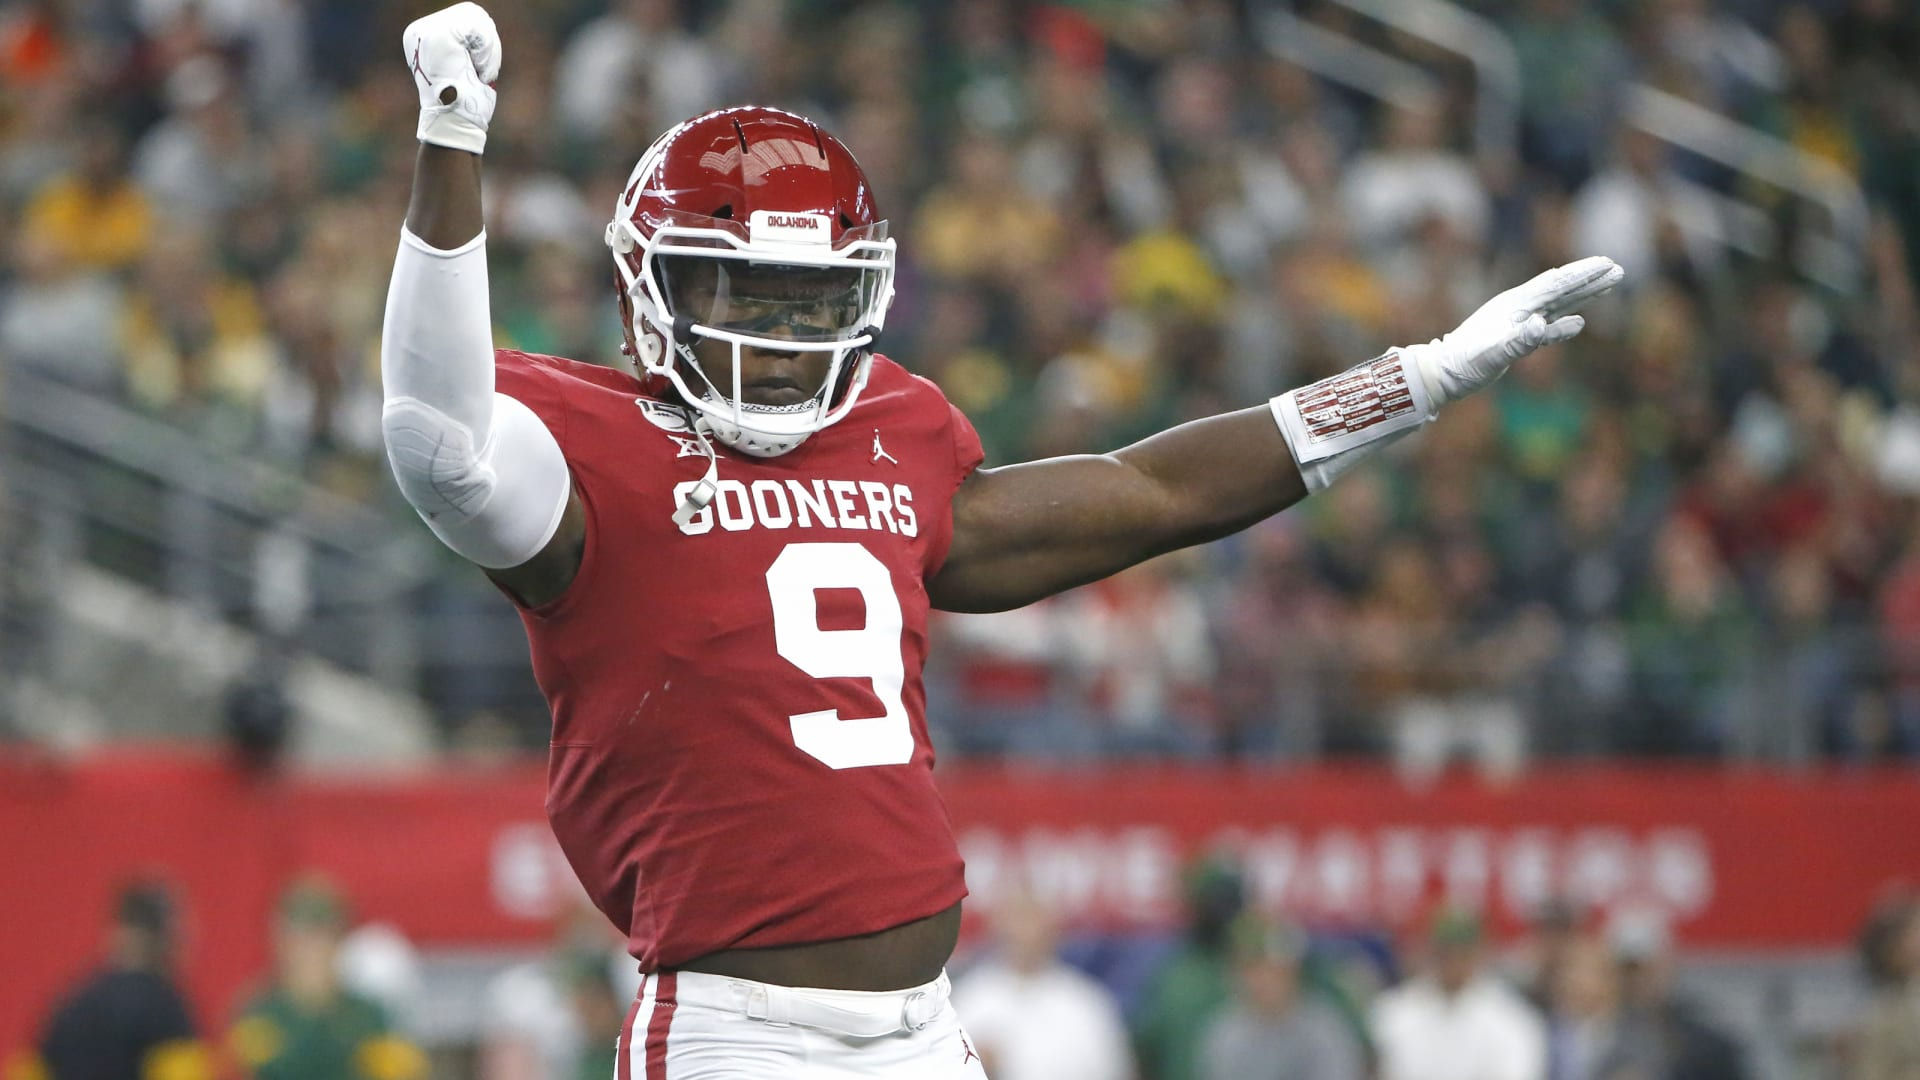 Denver Broncos: Full 7-round mock draft with trades